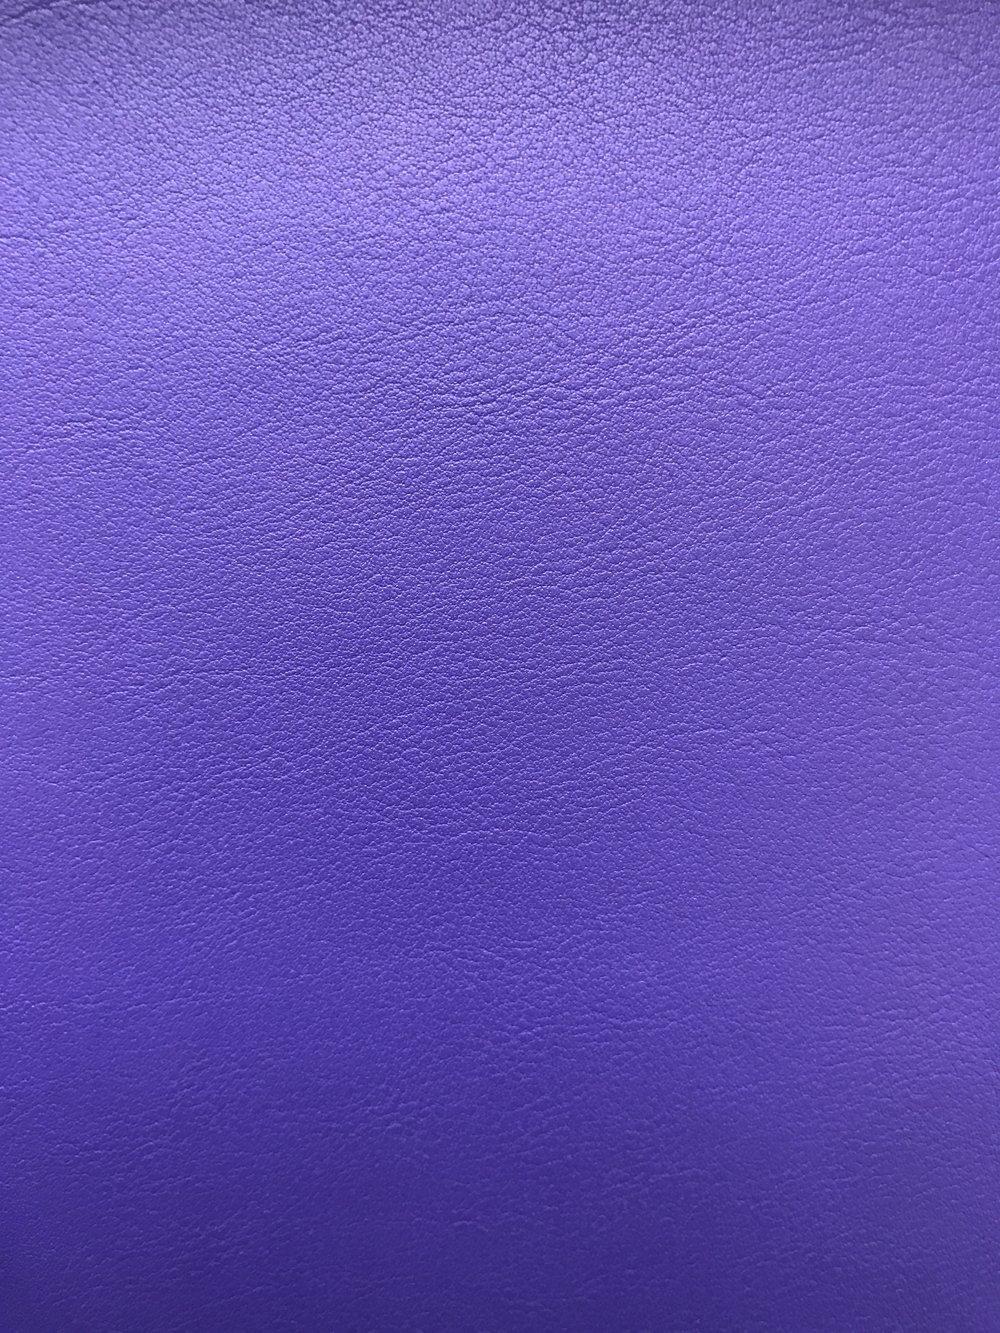 B60 Purple